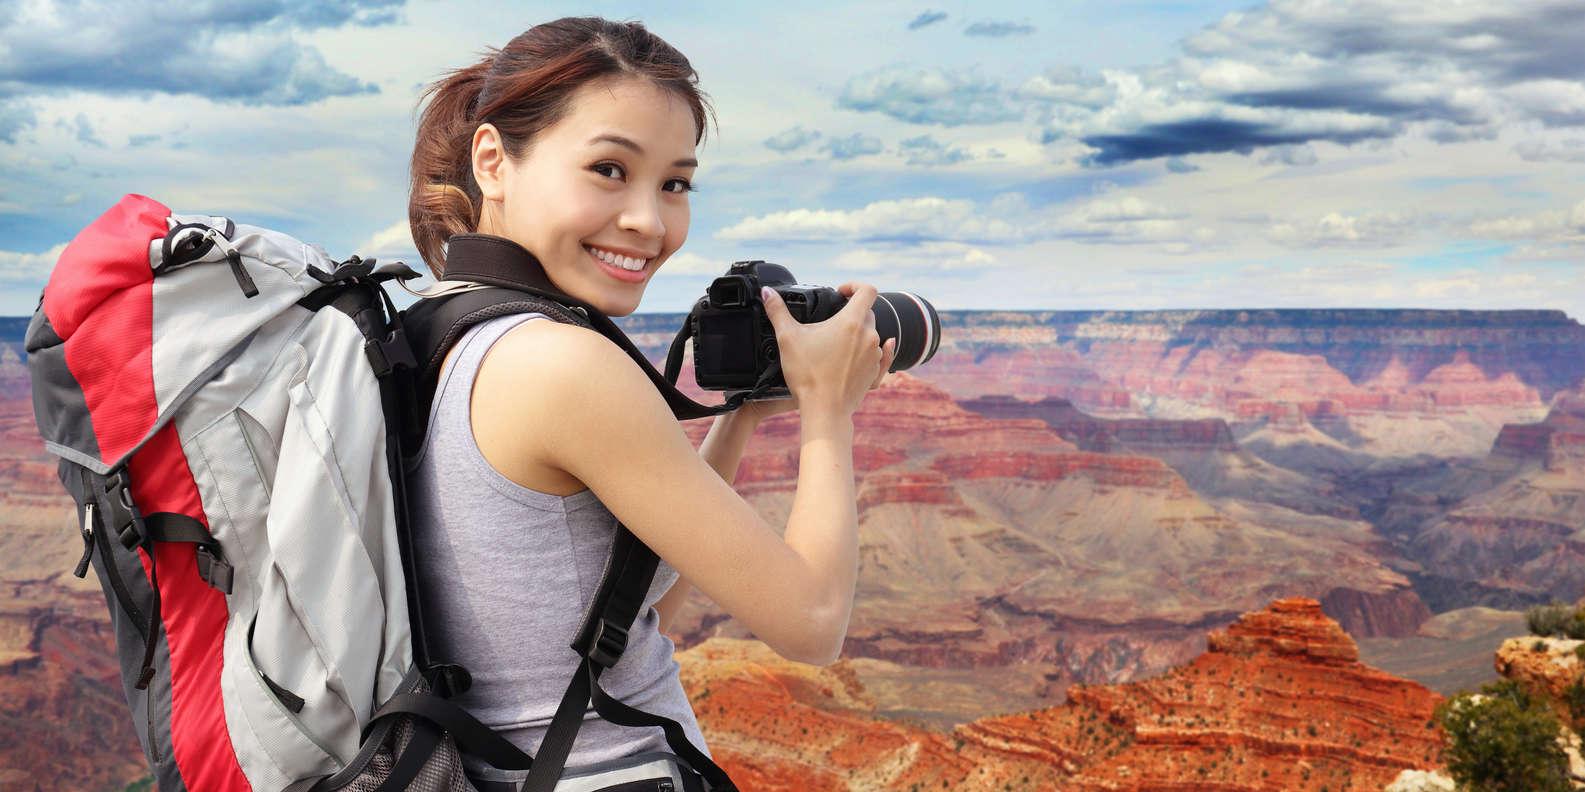 Take a Day Trip to the Grand Canyon